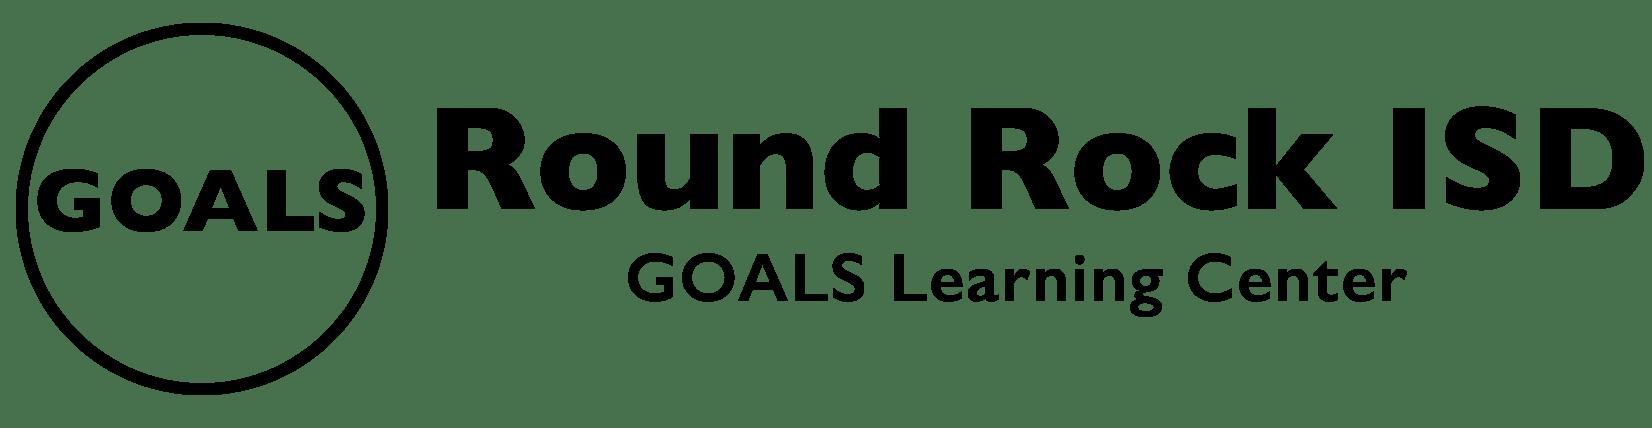 GOALS Learning Center